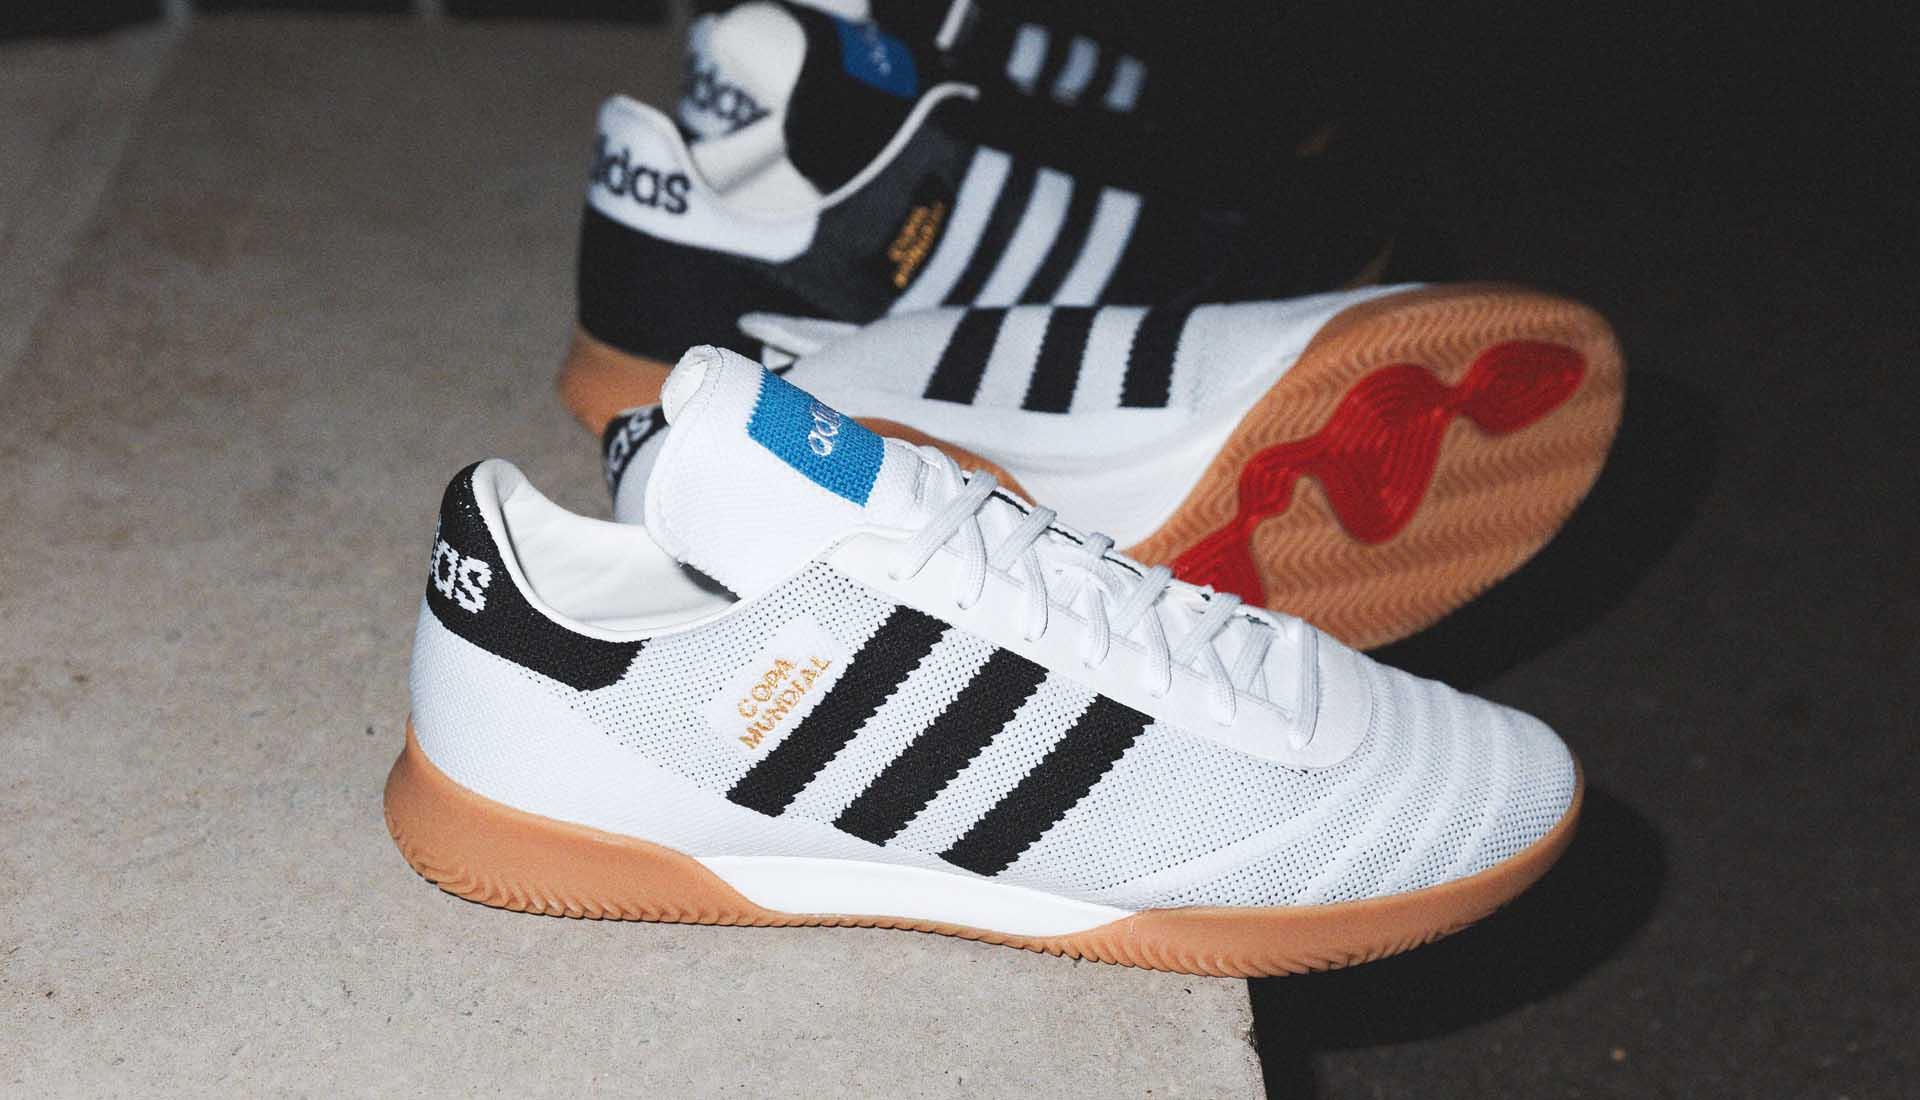 adidas lanceert Primeknit COPA Mundial sneakers